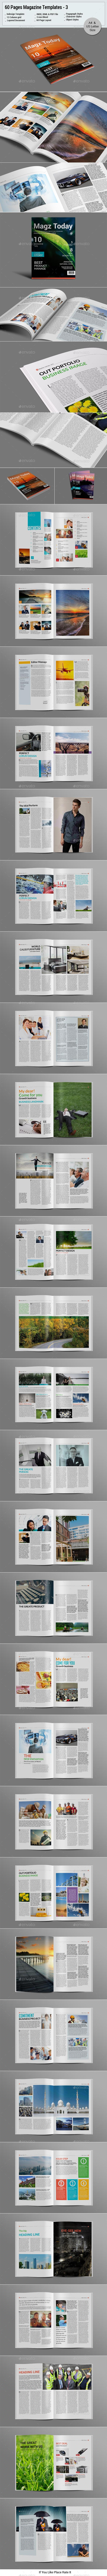 60 Pages Magazine Templates - 4 - Magazines Print Templates